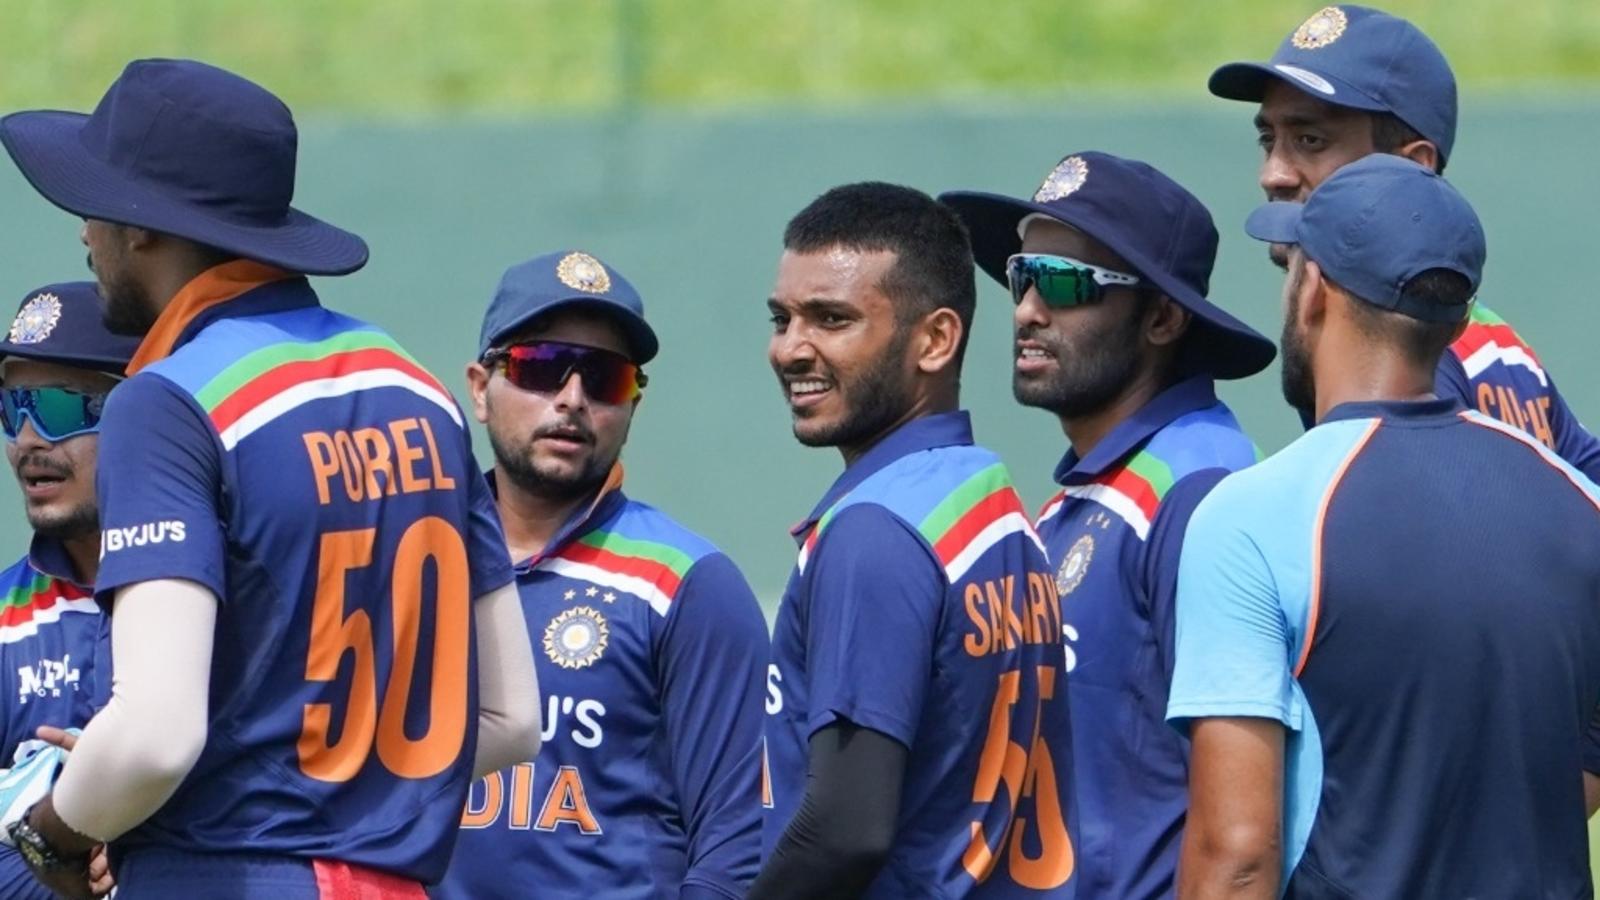 India vs Sri Lanka series pushed back due to Covid cases in Sri Lanka camp  | Cricket - Hindustan Times